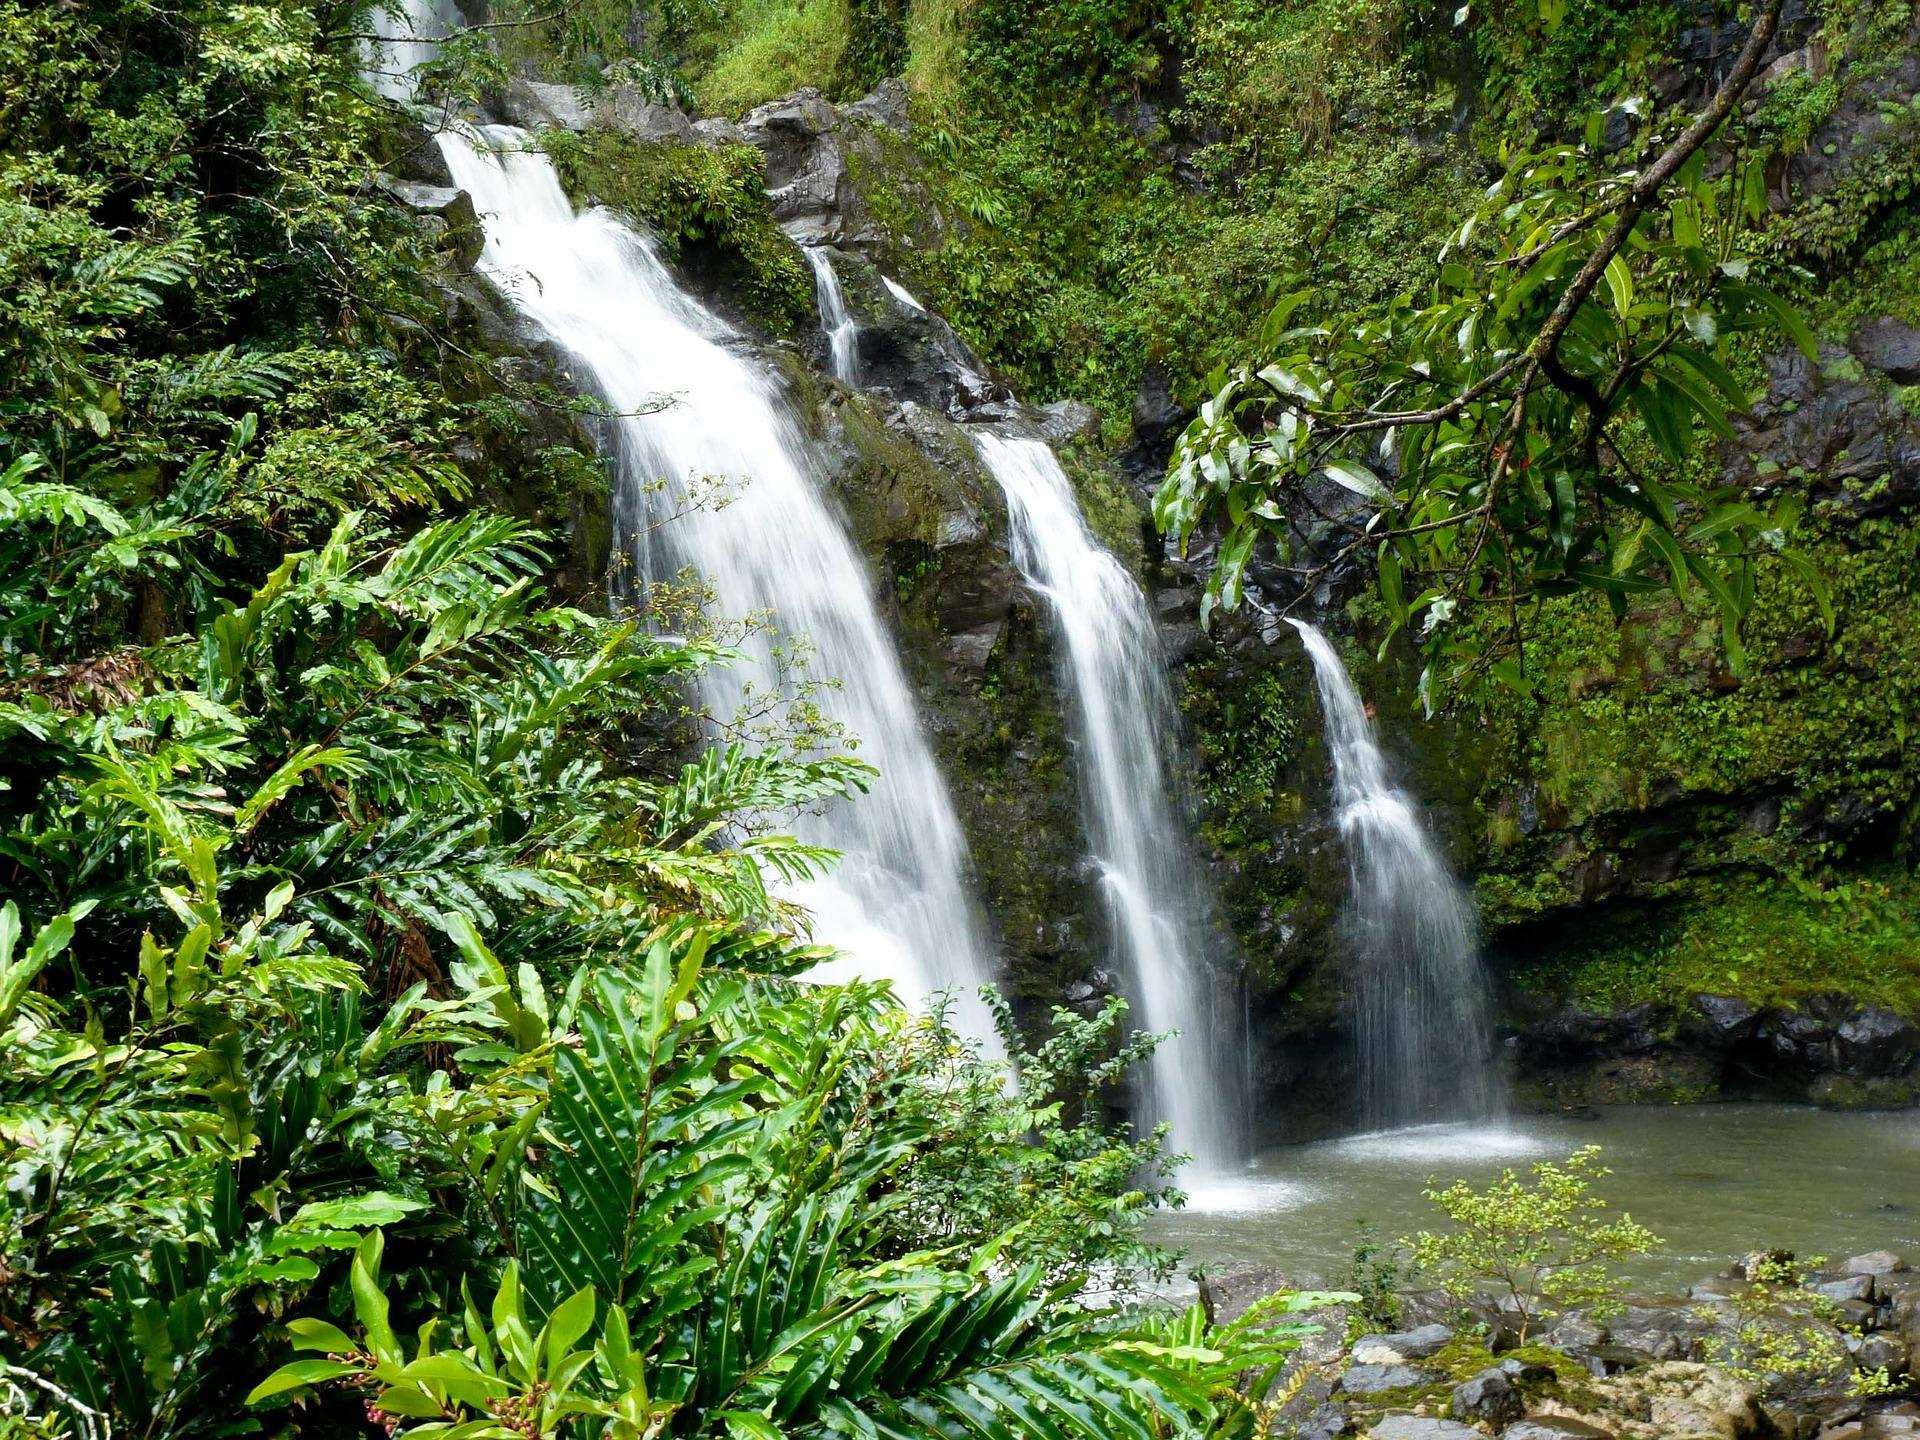 64337feb hawaii nature - ハワイの歴史と伝統文化を体験できるおすすめツアー10選